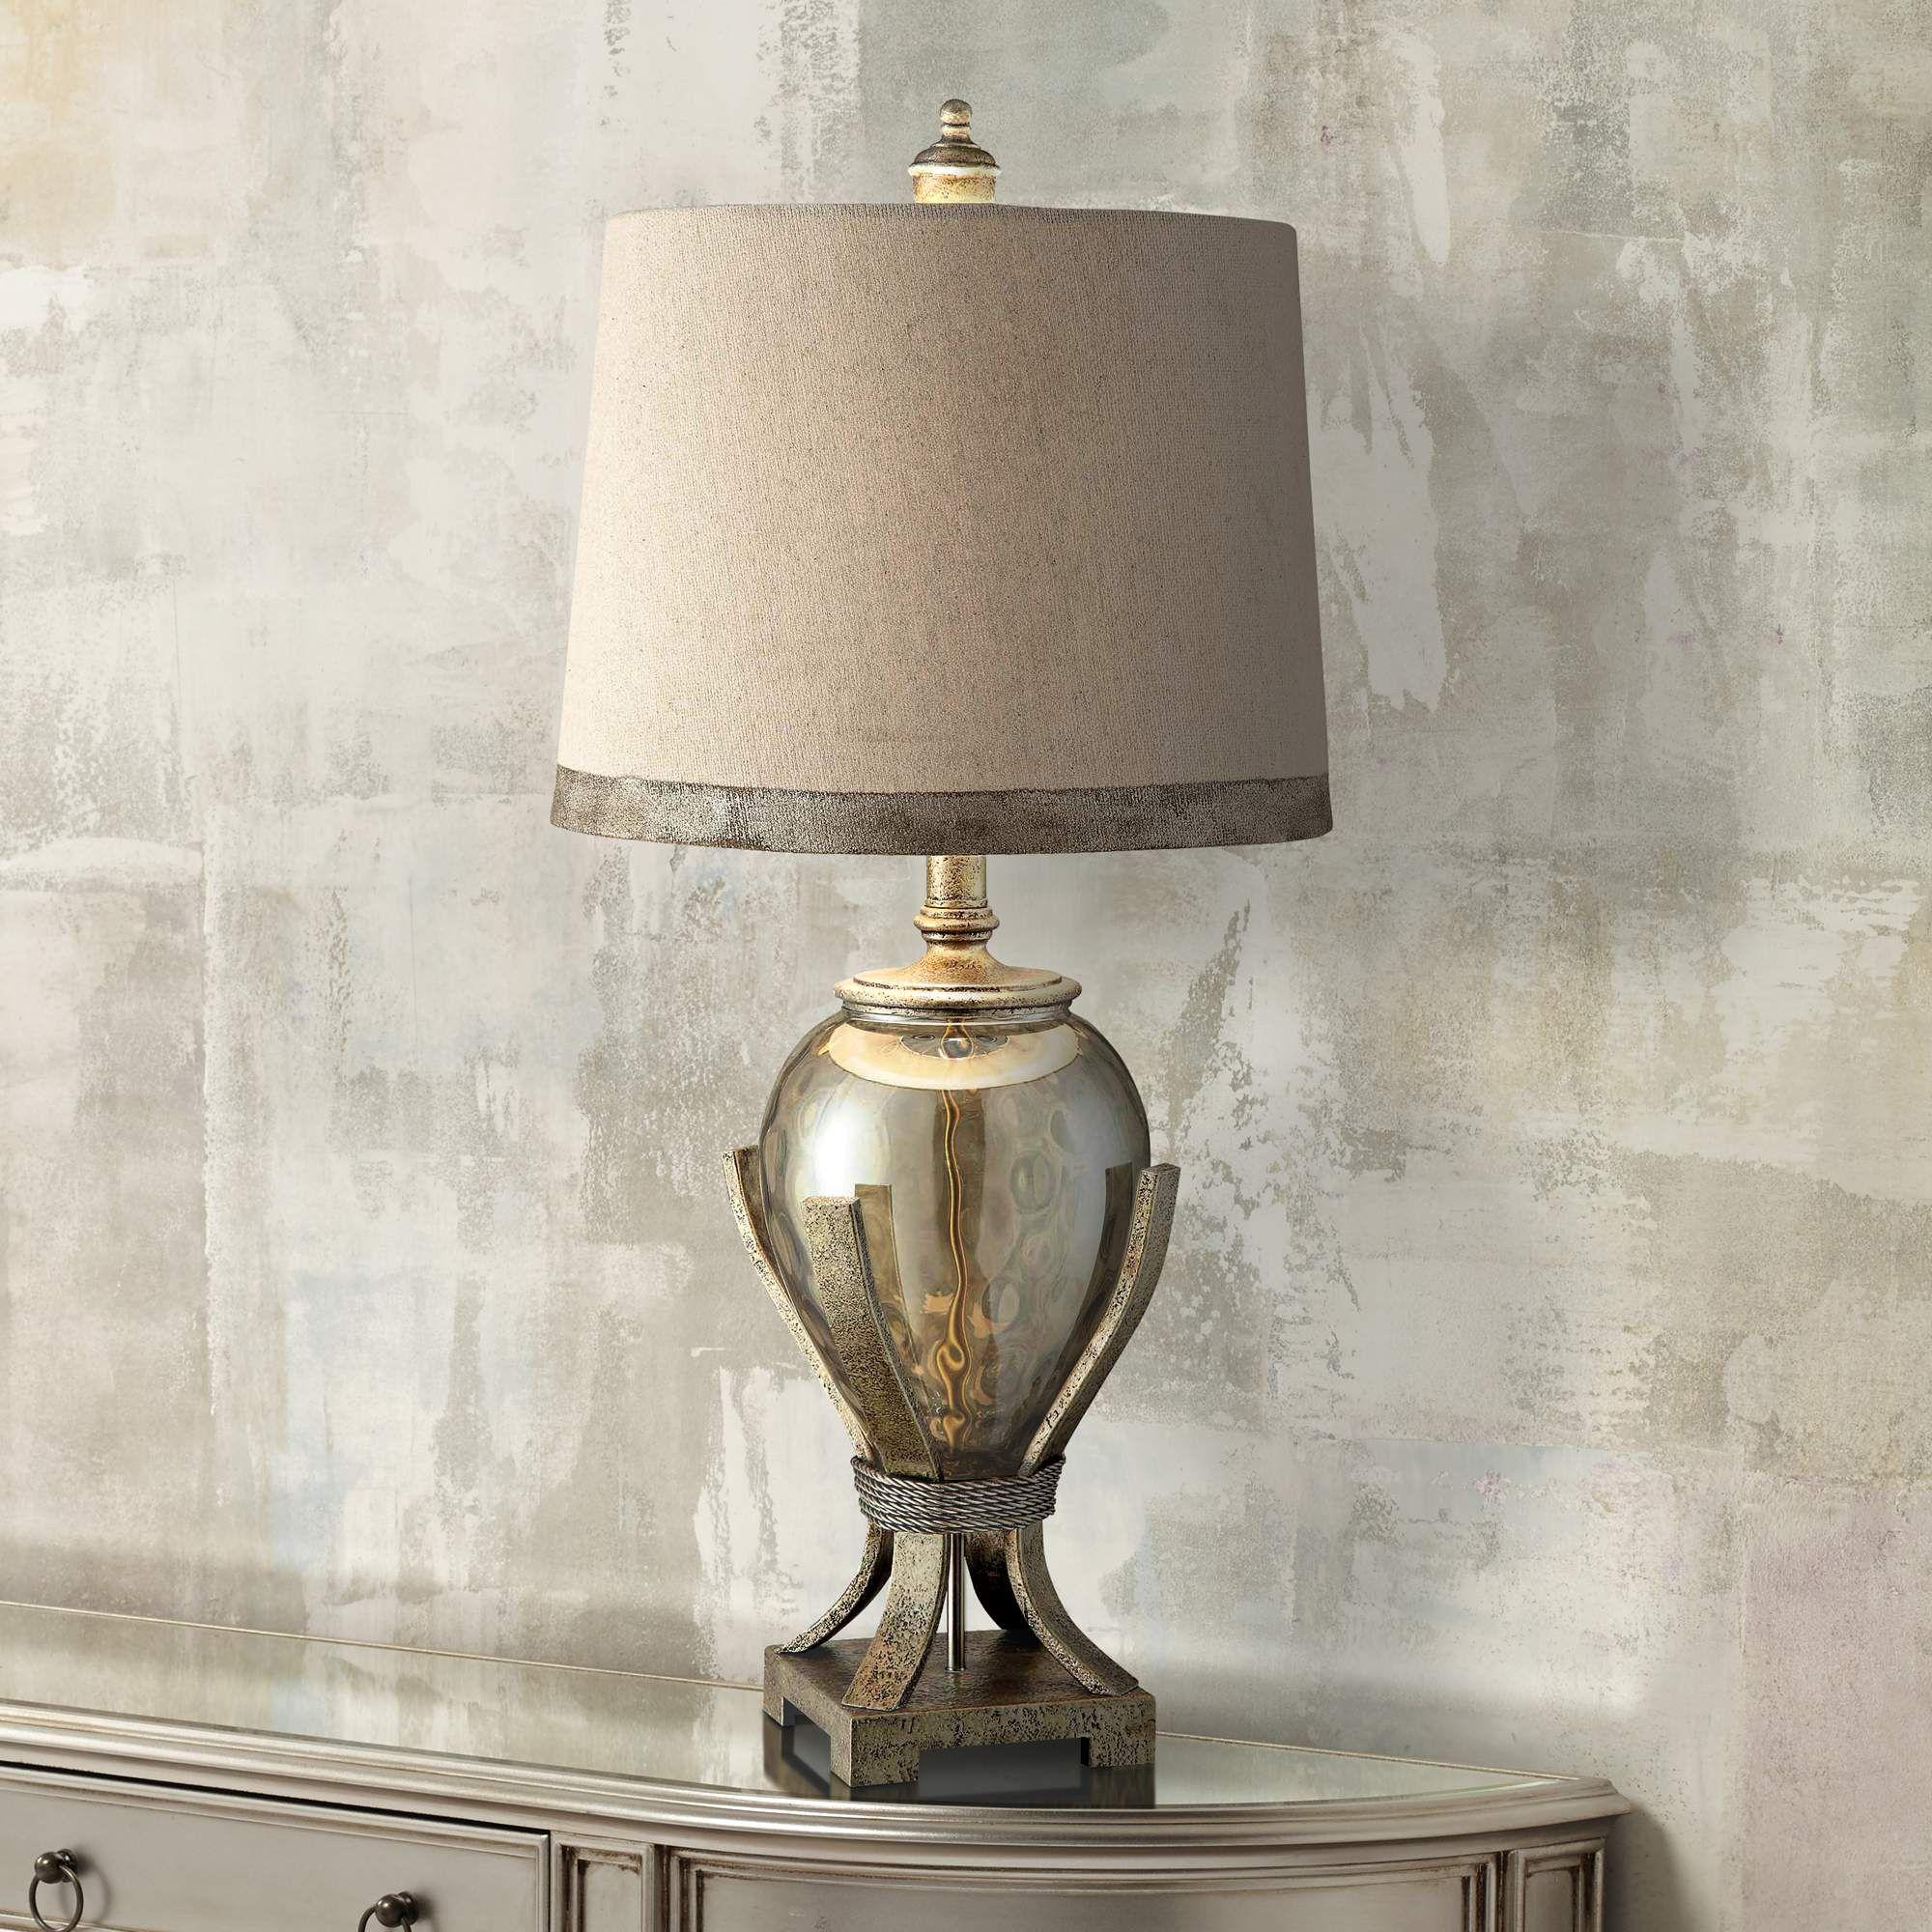 Crestview collection hawthorne glass amphora table lamp style crestview collection hawthorne glass amphora table lamp 7g159 lamps plus geotapseo Gallery